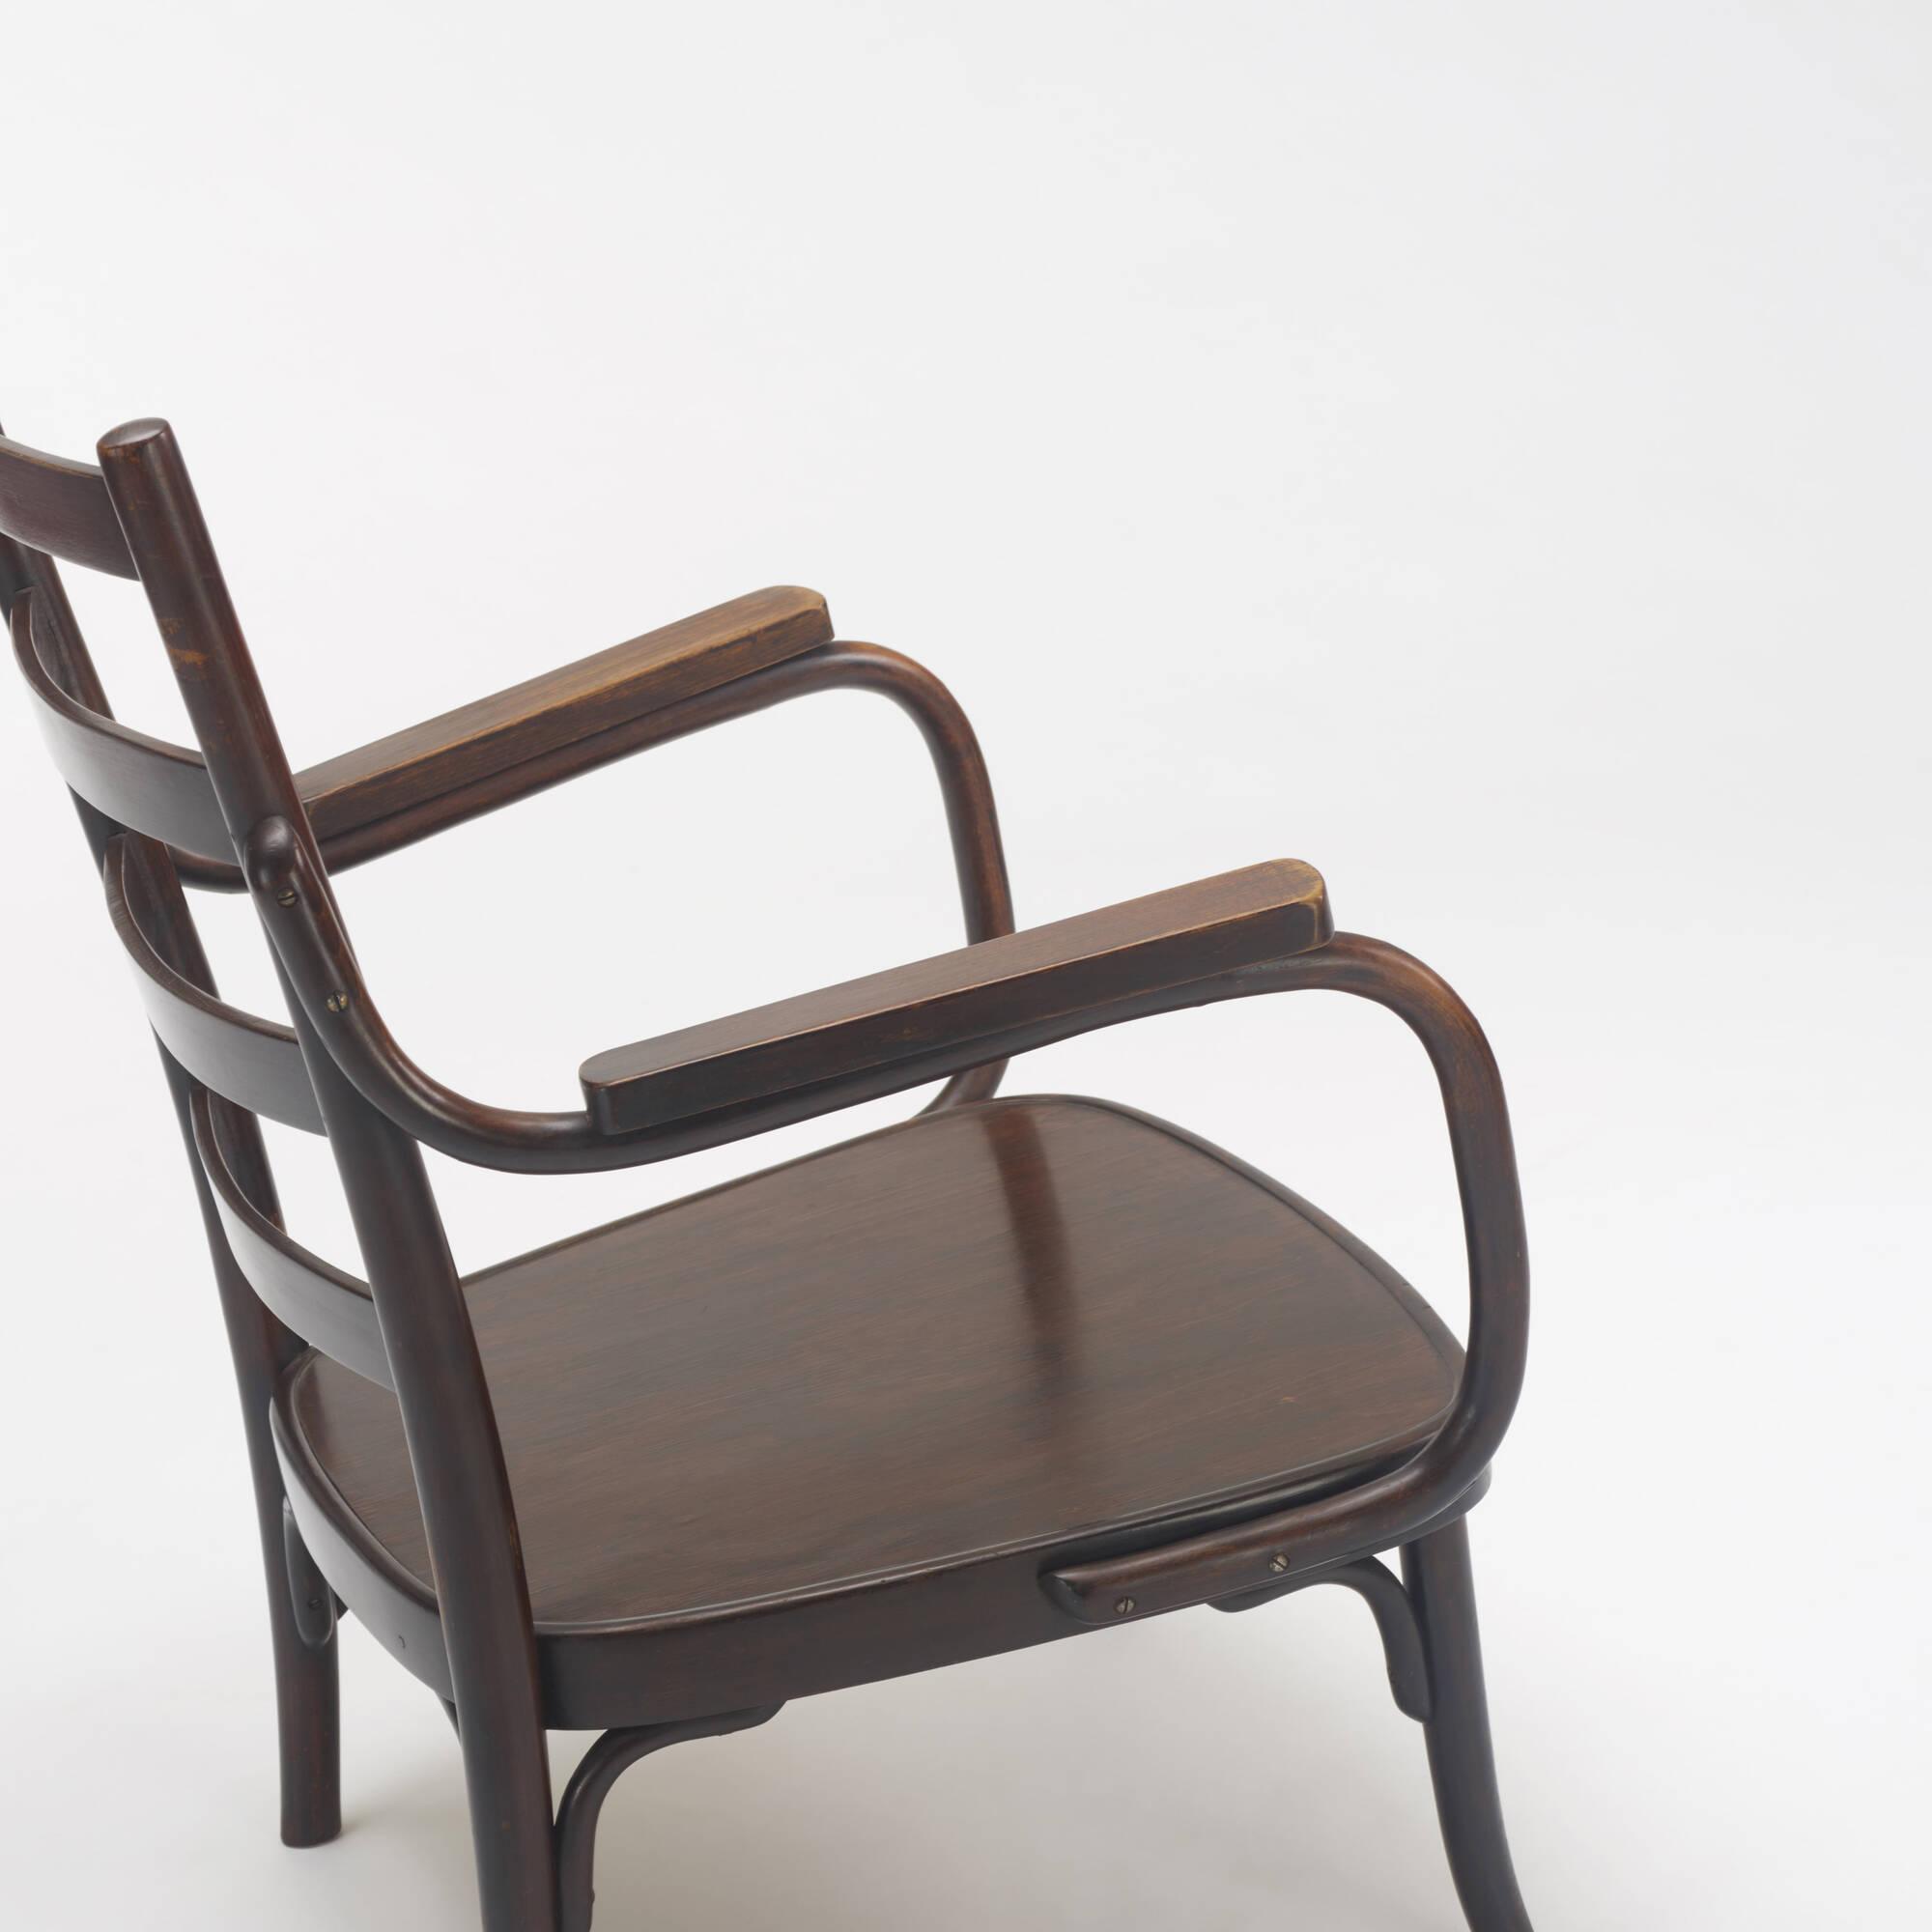 241: Josef Frank / armchair, model A403F (4 of 5)